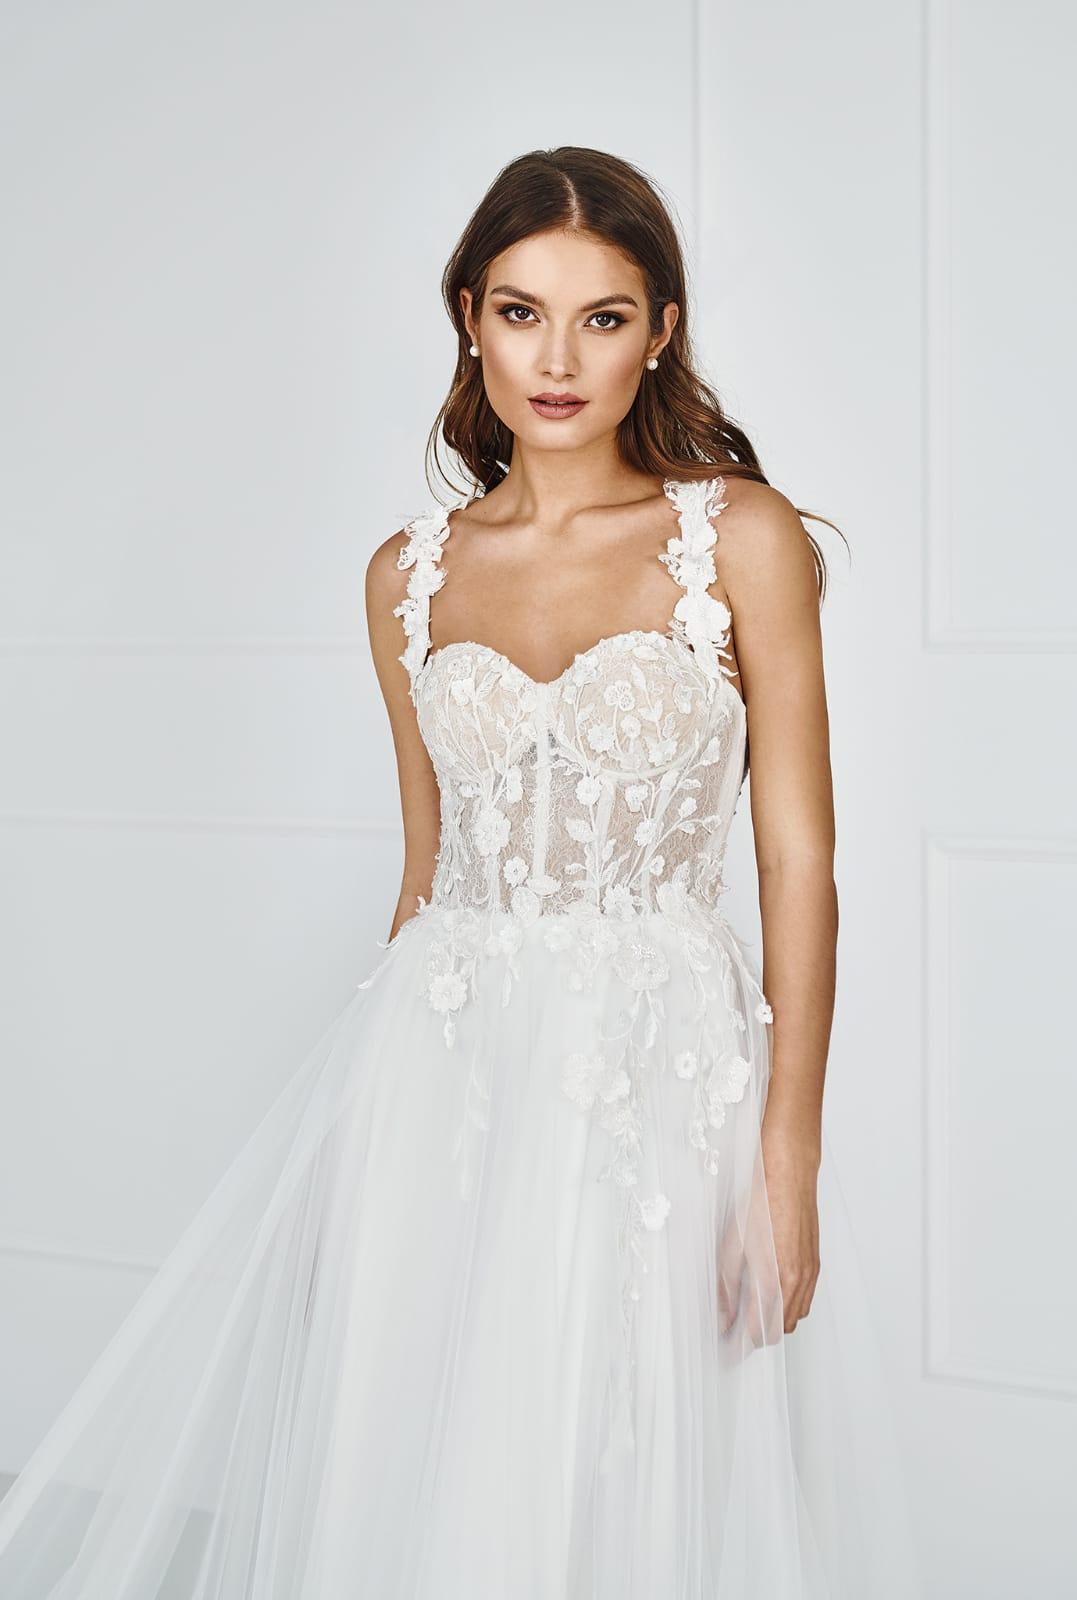 suknia ślubna z kwiatami 3d, suknia ślubna mielec